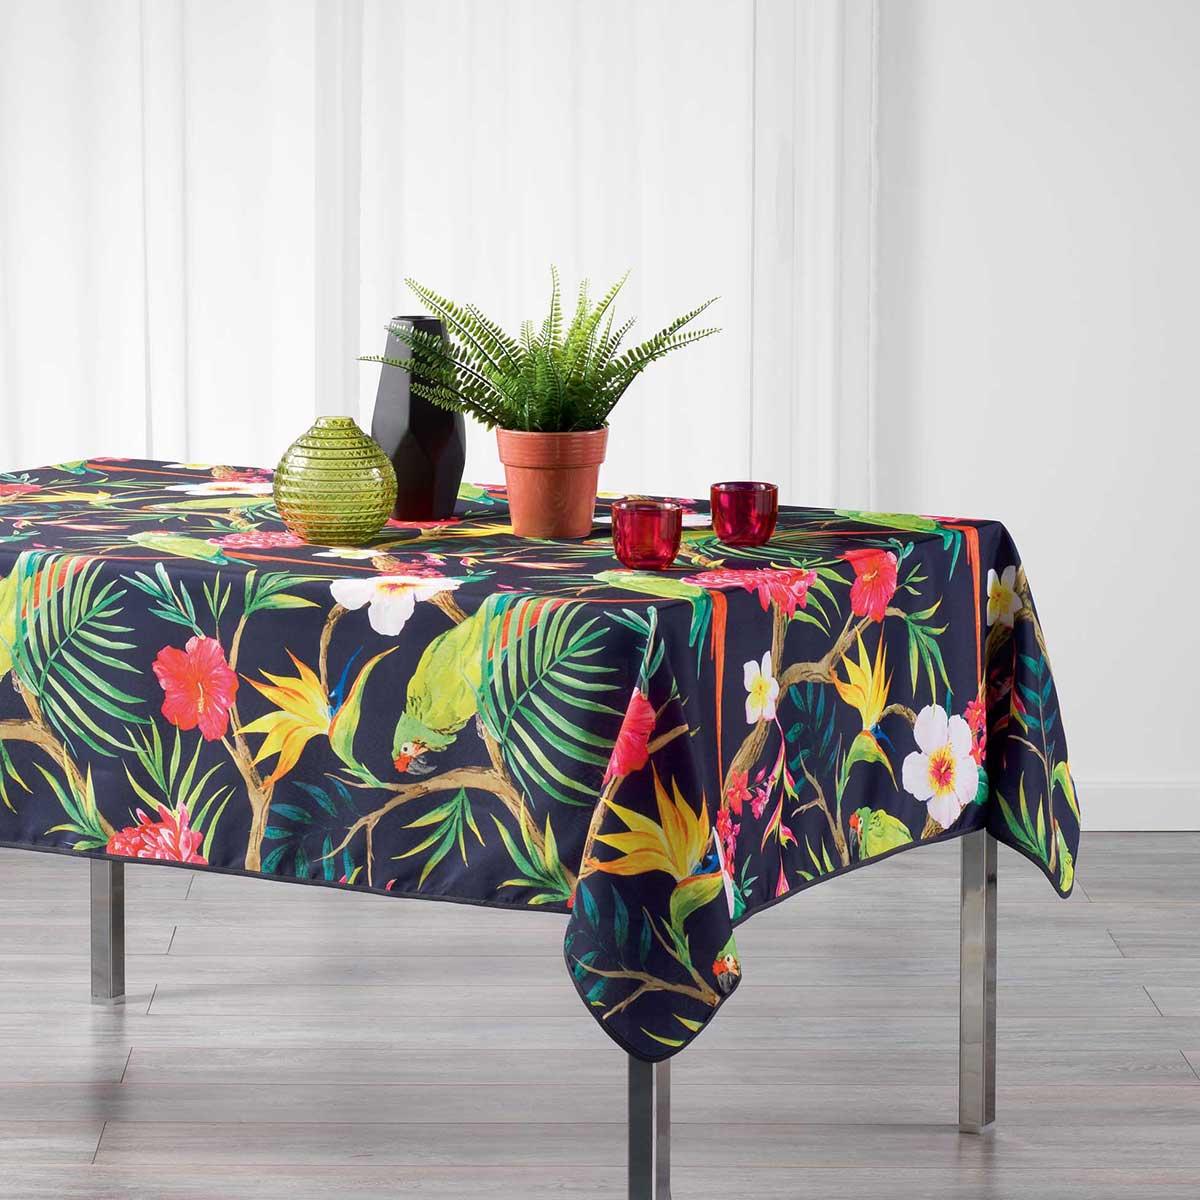 Nappe rectangulaire impressions tropicales - Prune - 150 x 240 cm